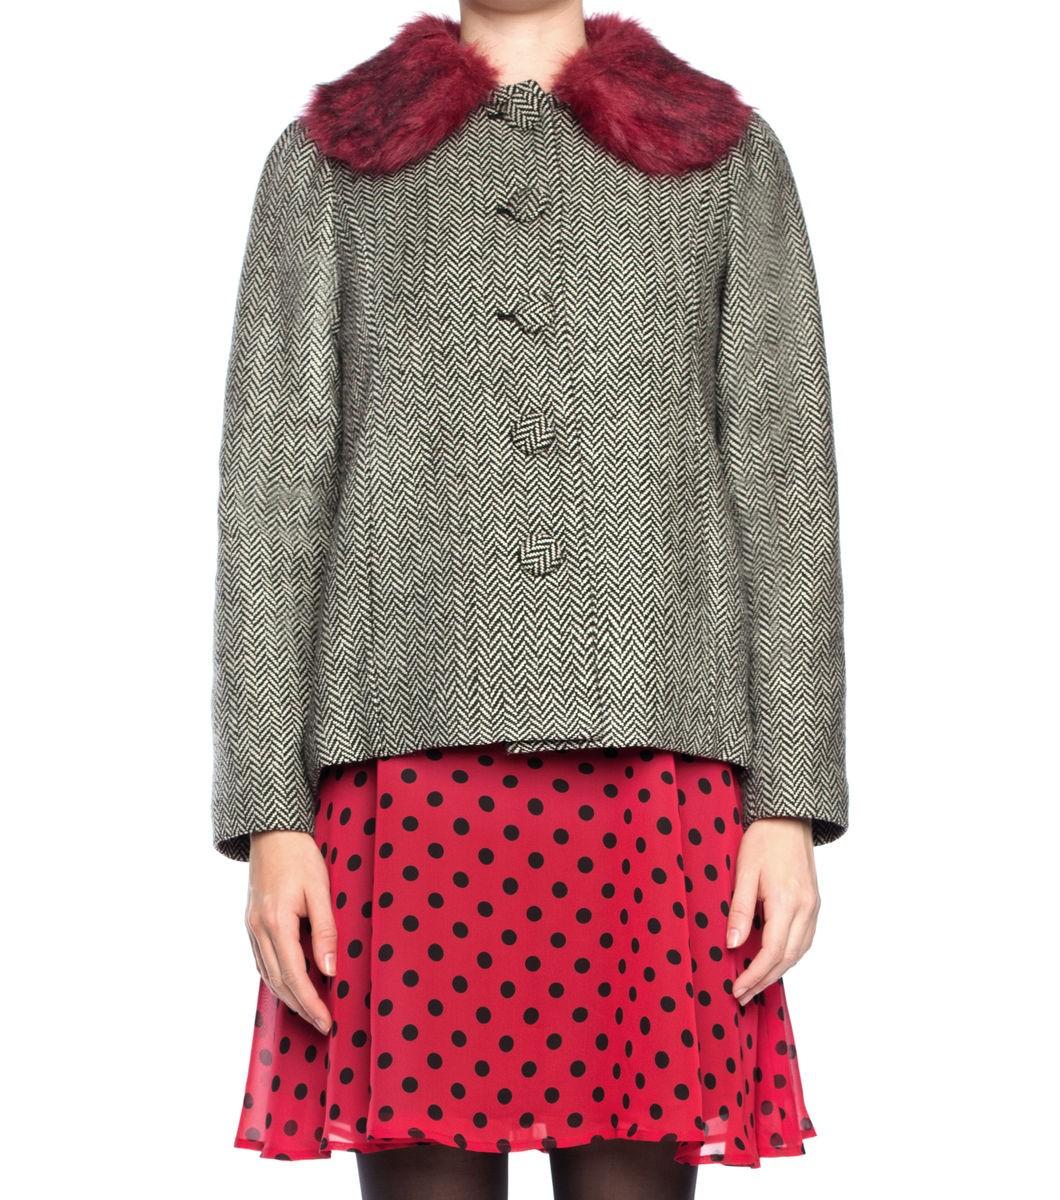 Lady Mae Jacket